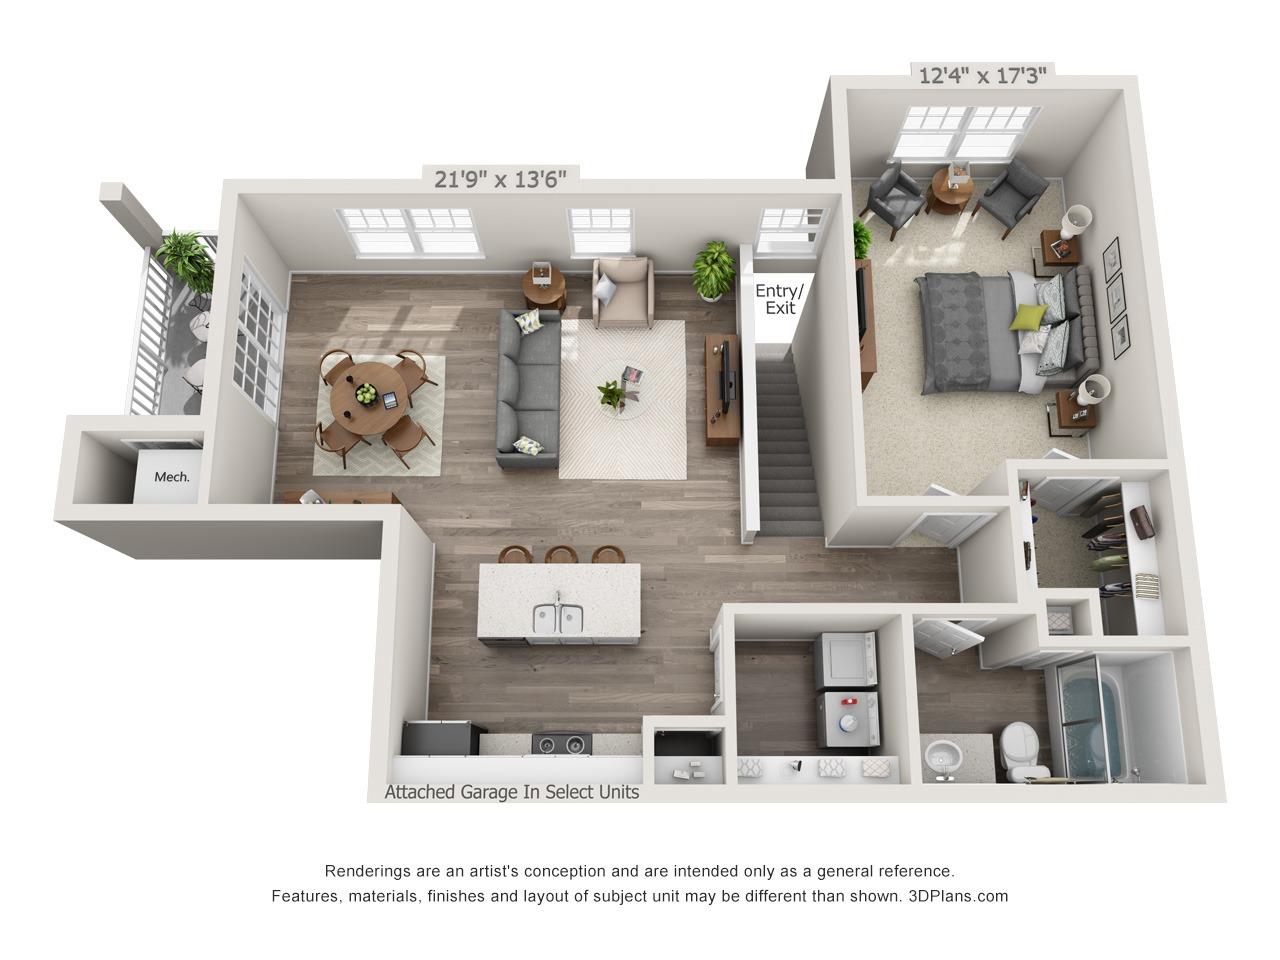 Jade - 1 Bed / 1 Bath with Garage - 2nd Floor - 947 SF